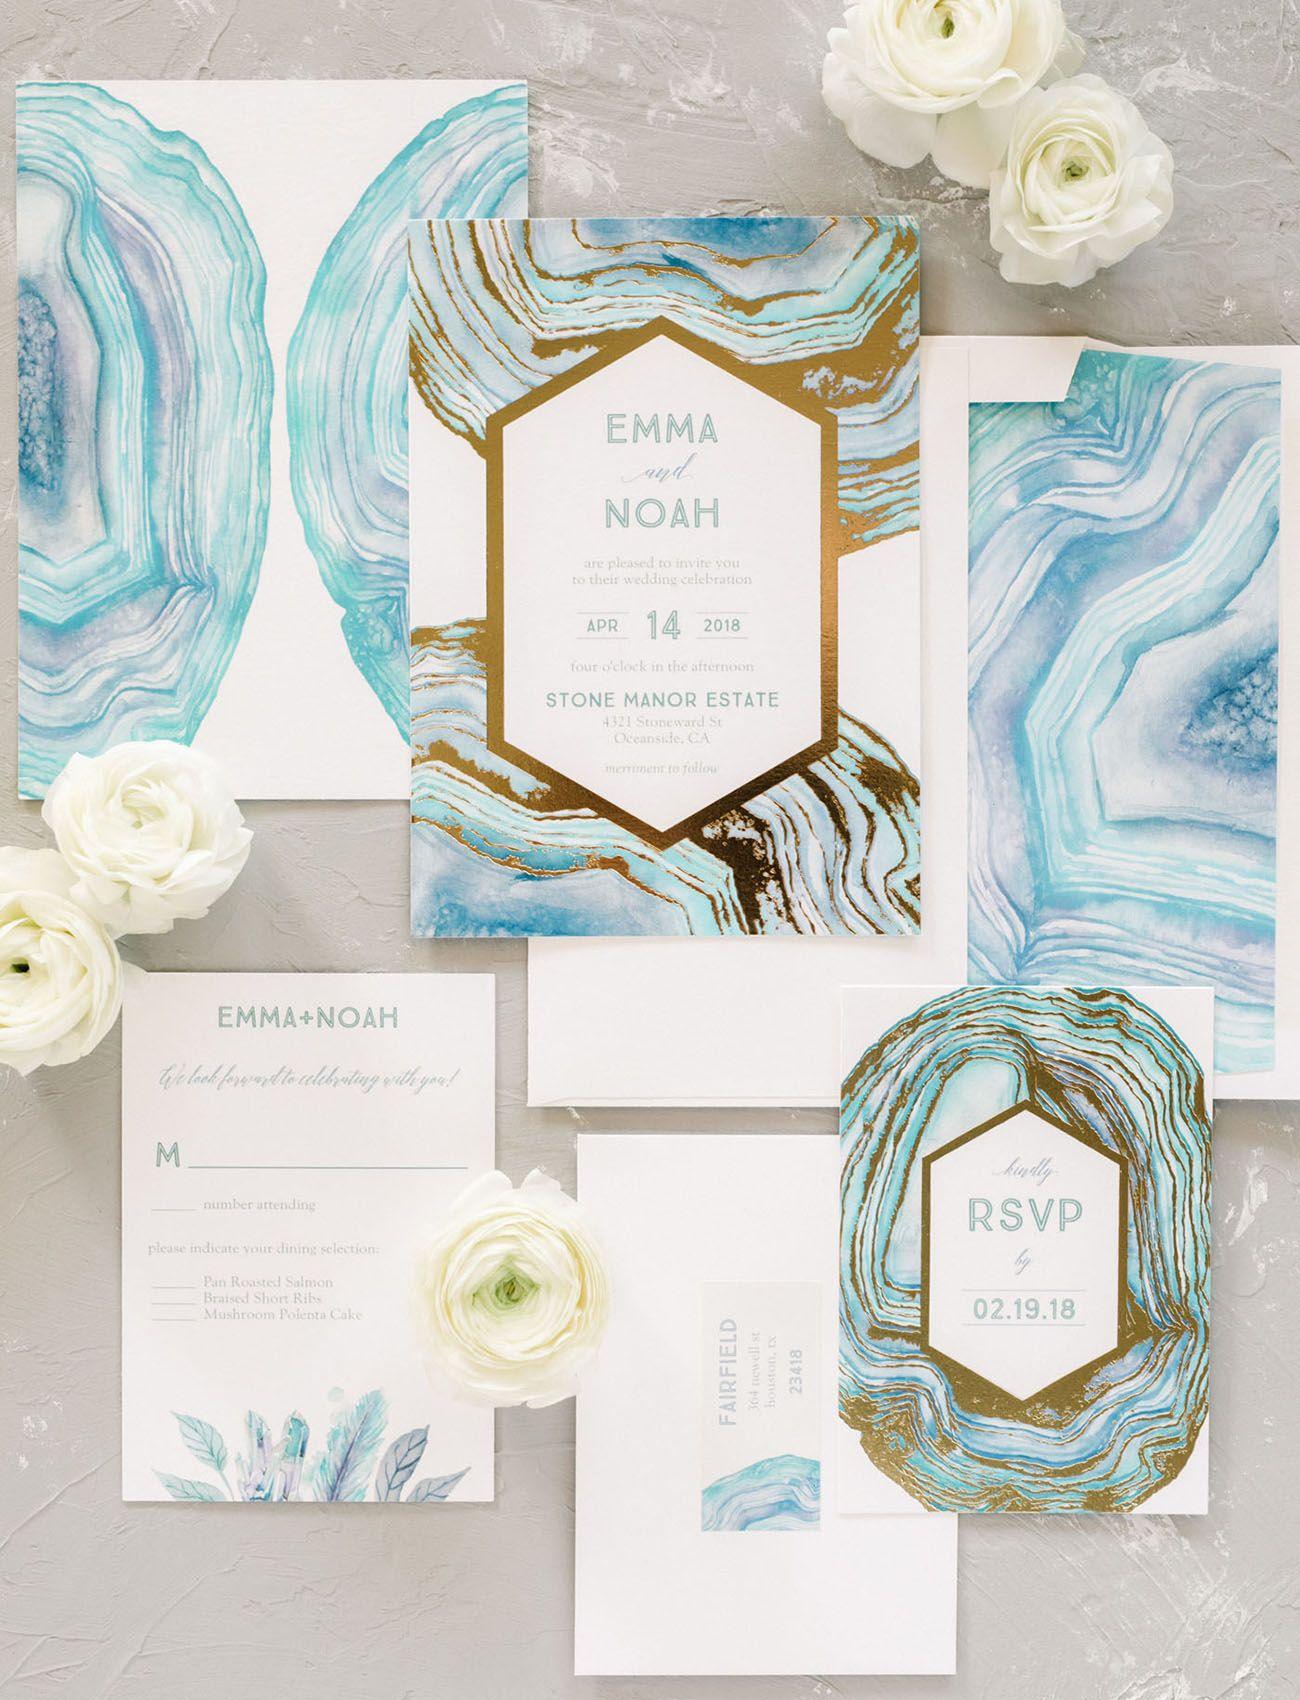 Custom Wedding Invitations with The Wedding Shop by Shutterfly